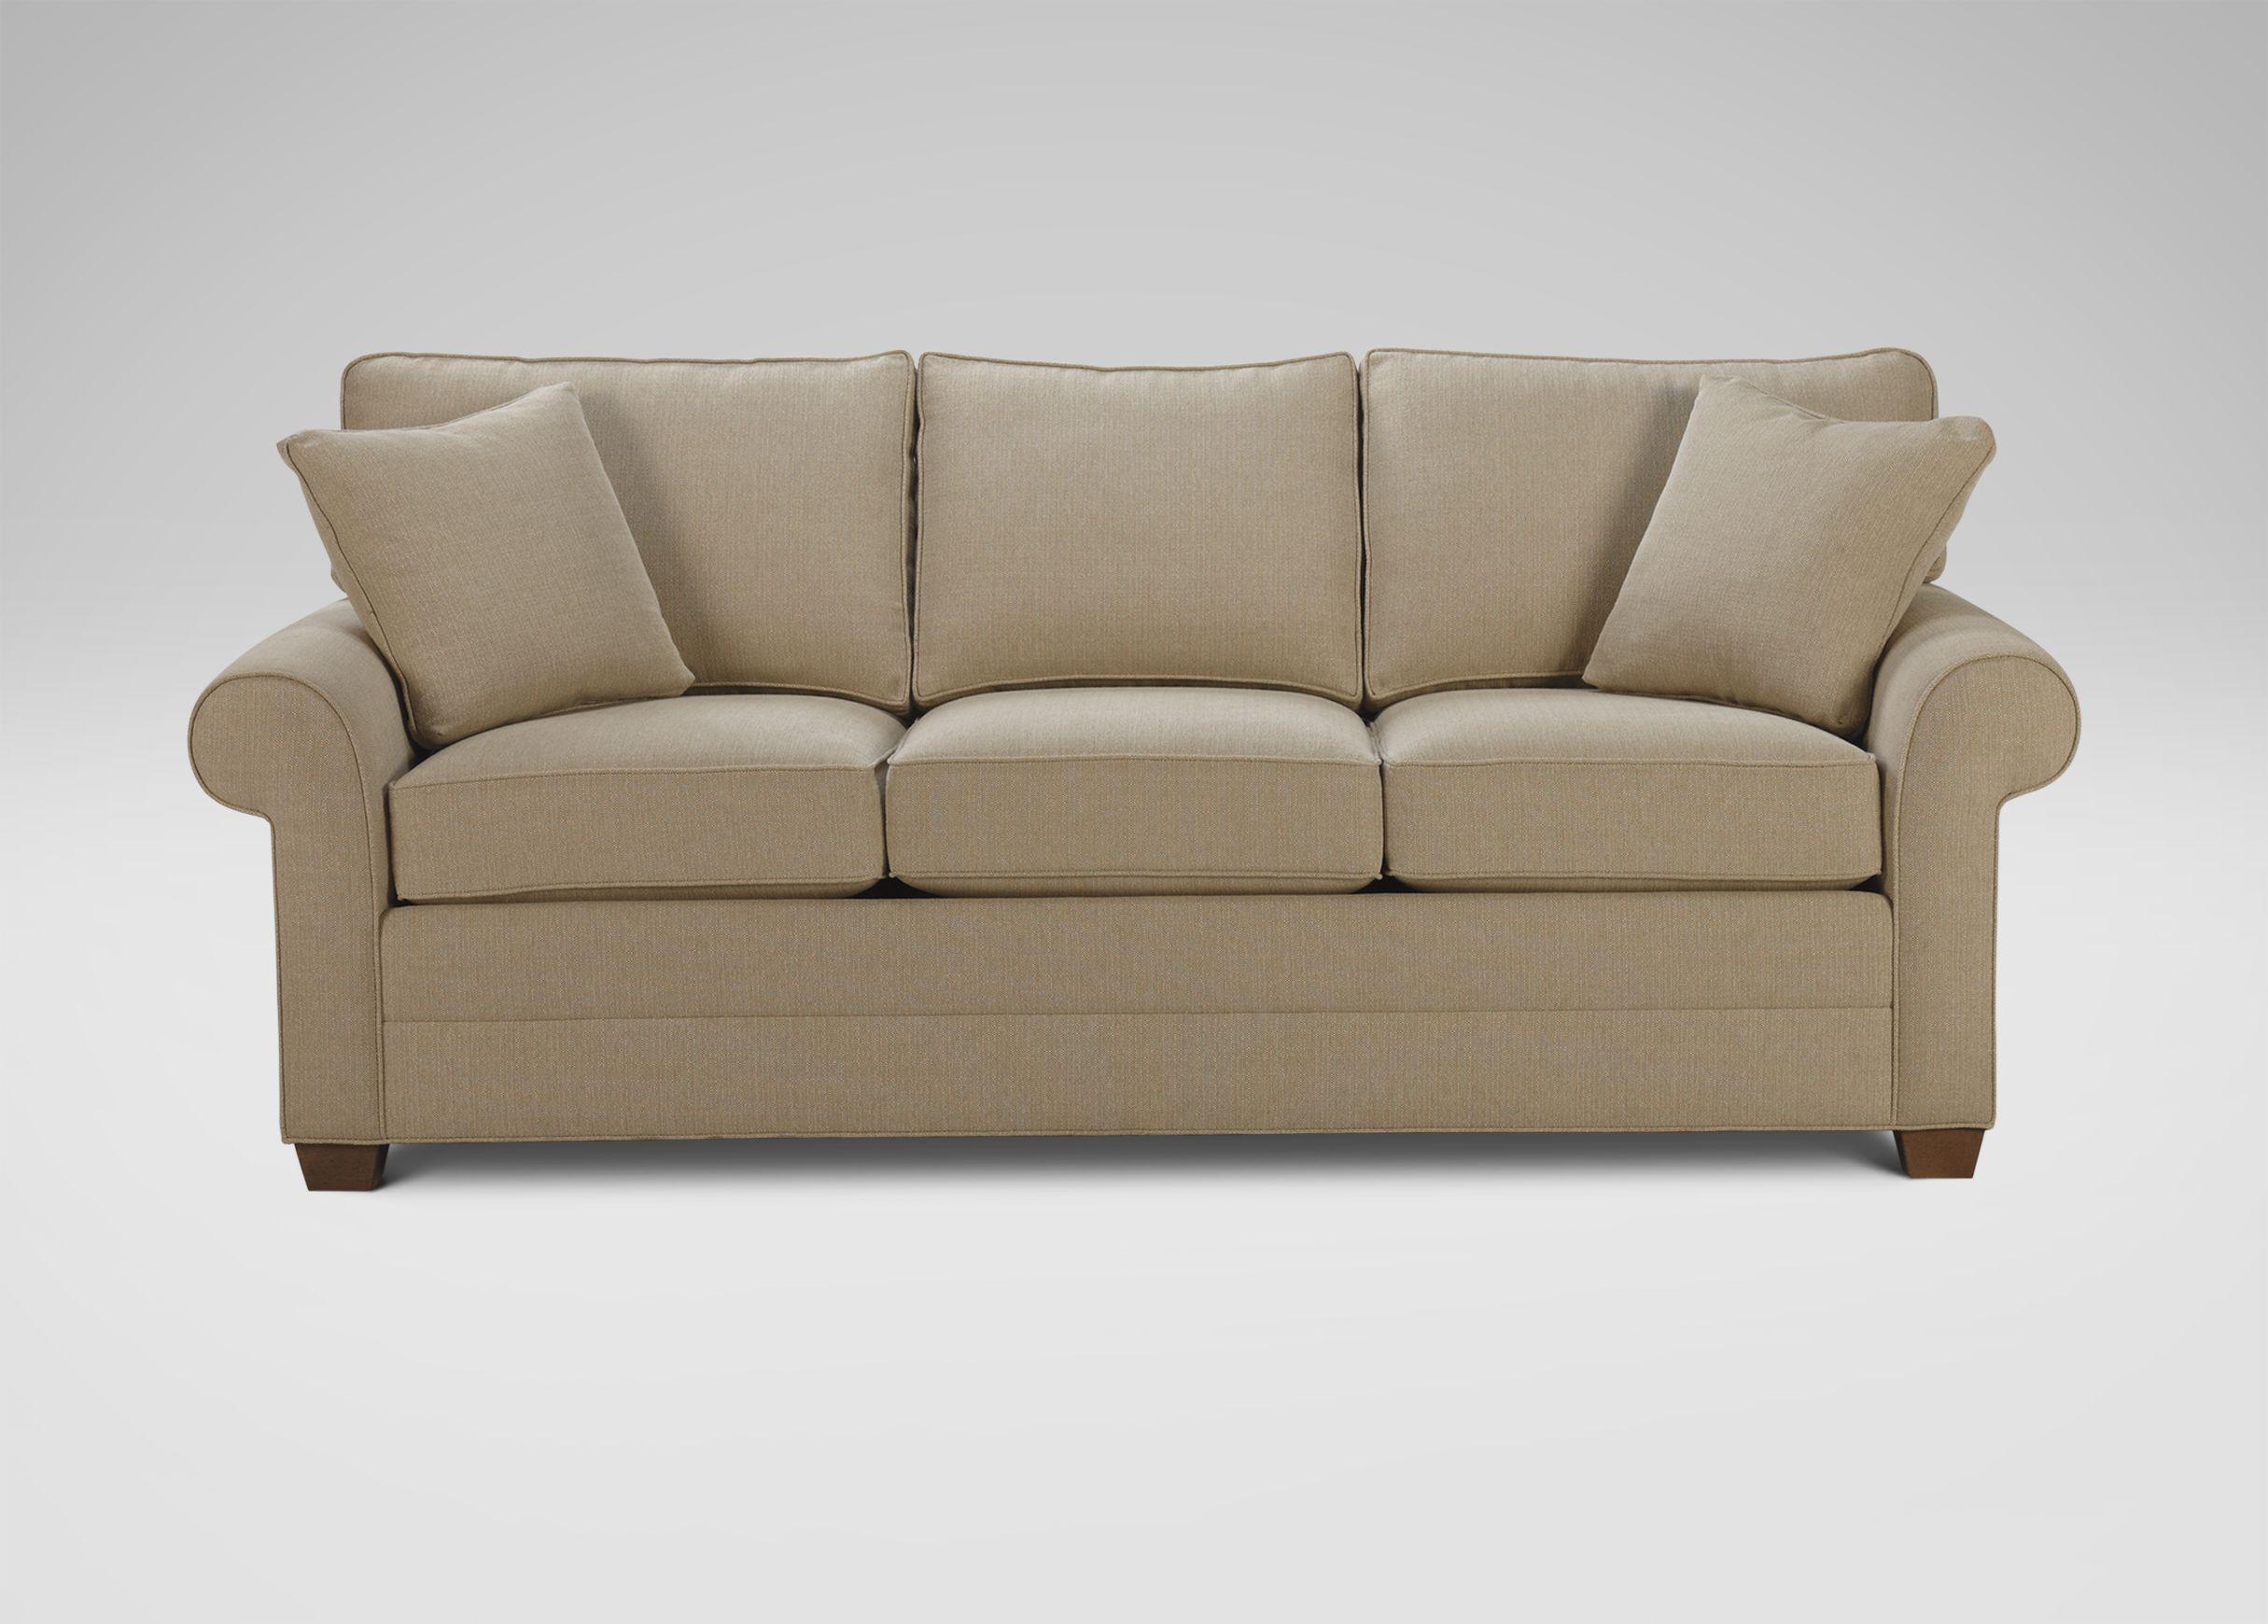 Bennett RollArm Sofa CaymanGrain Ethan Allen Living Room - Ethan allen chadwick sofa